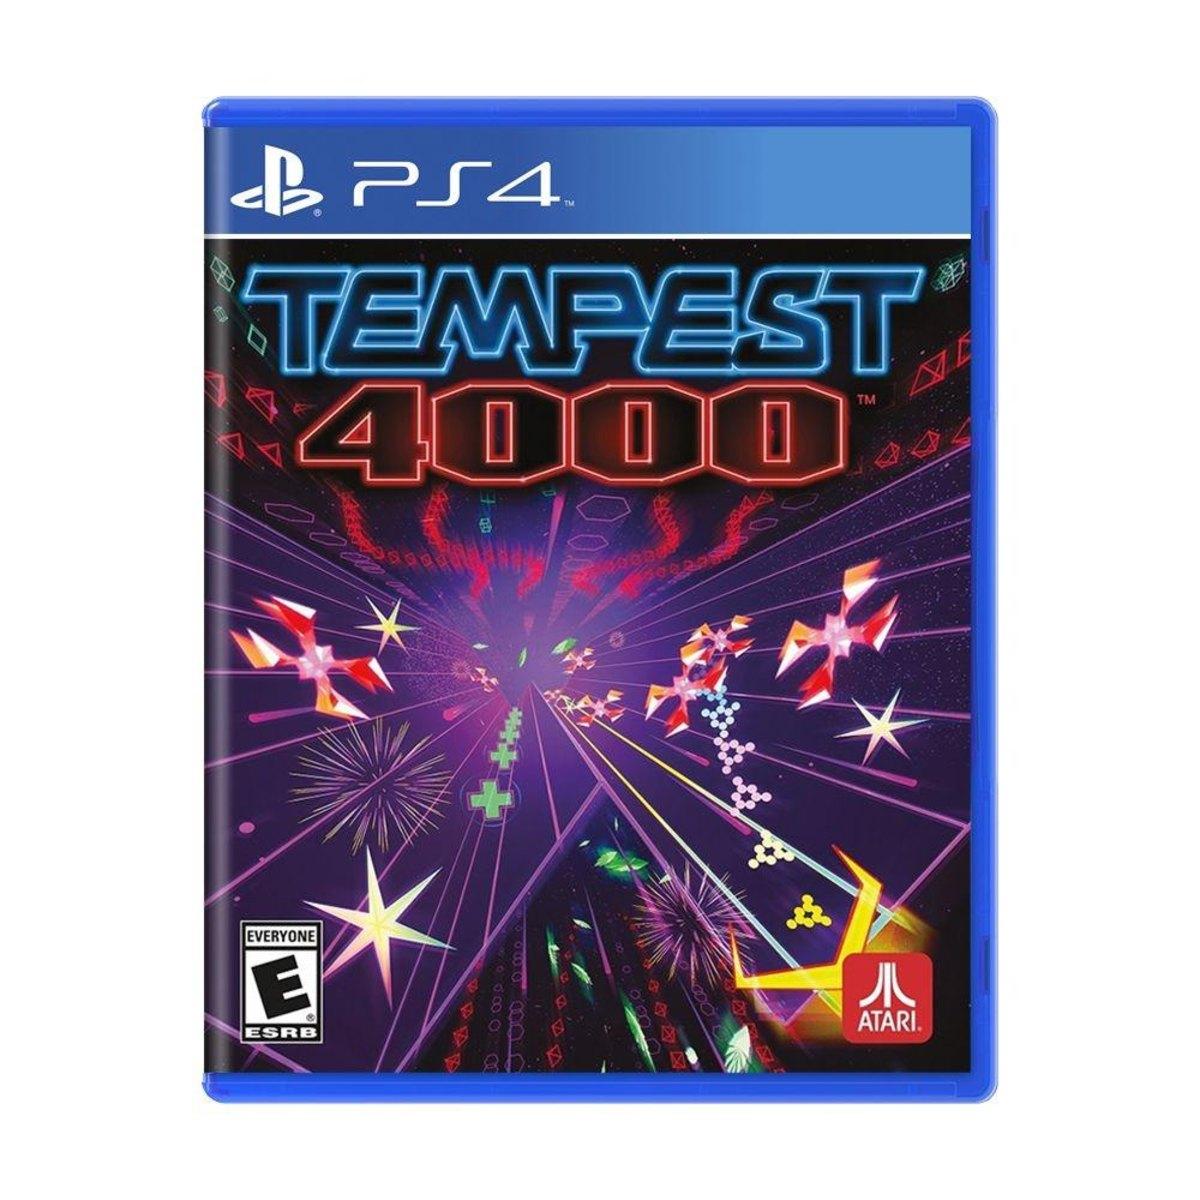 Jogo Tempest 4000 - Playstation 4 - Atari